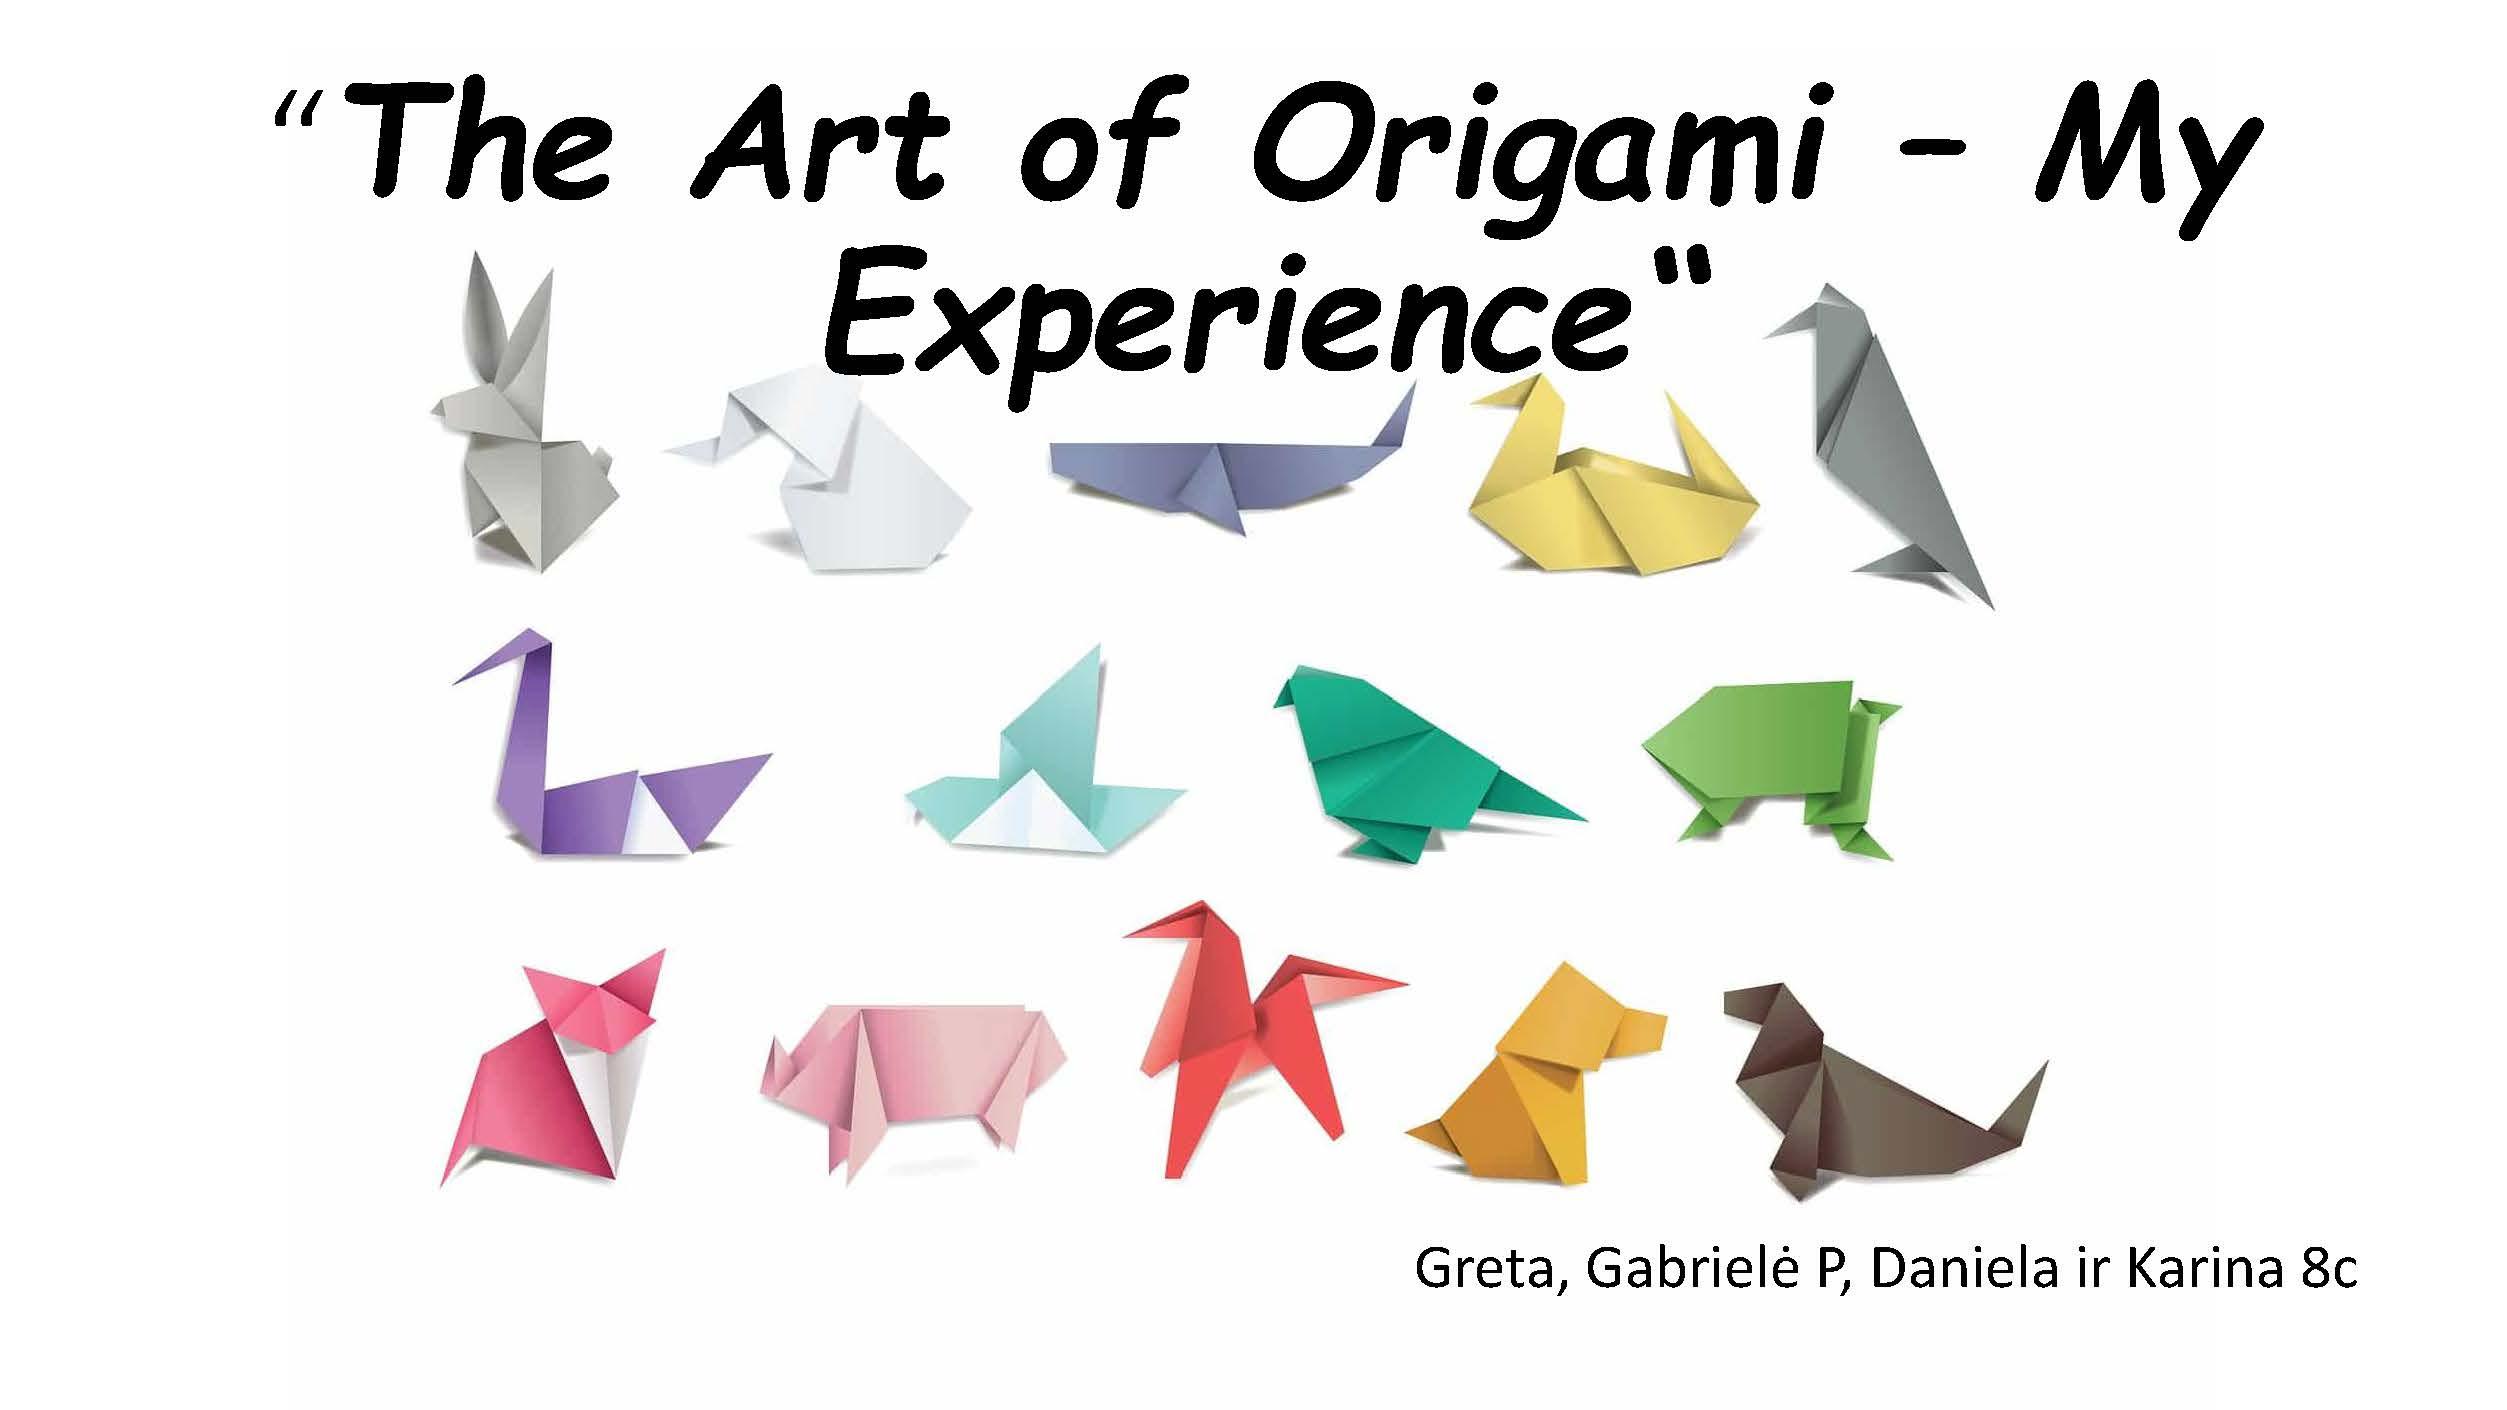 The-Art-of-Origami-–-My-Experience-karina-greta-daniela-gabriele-p_Page_01